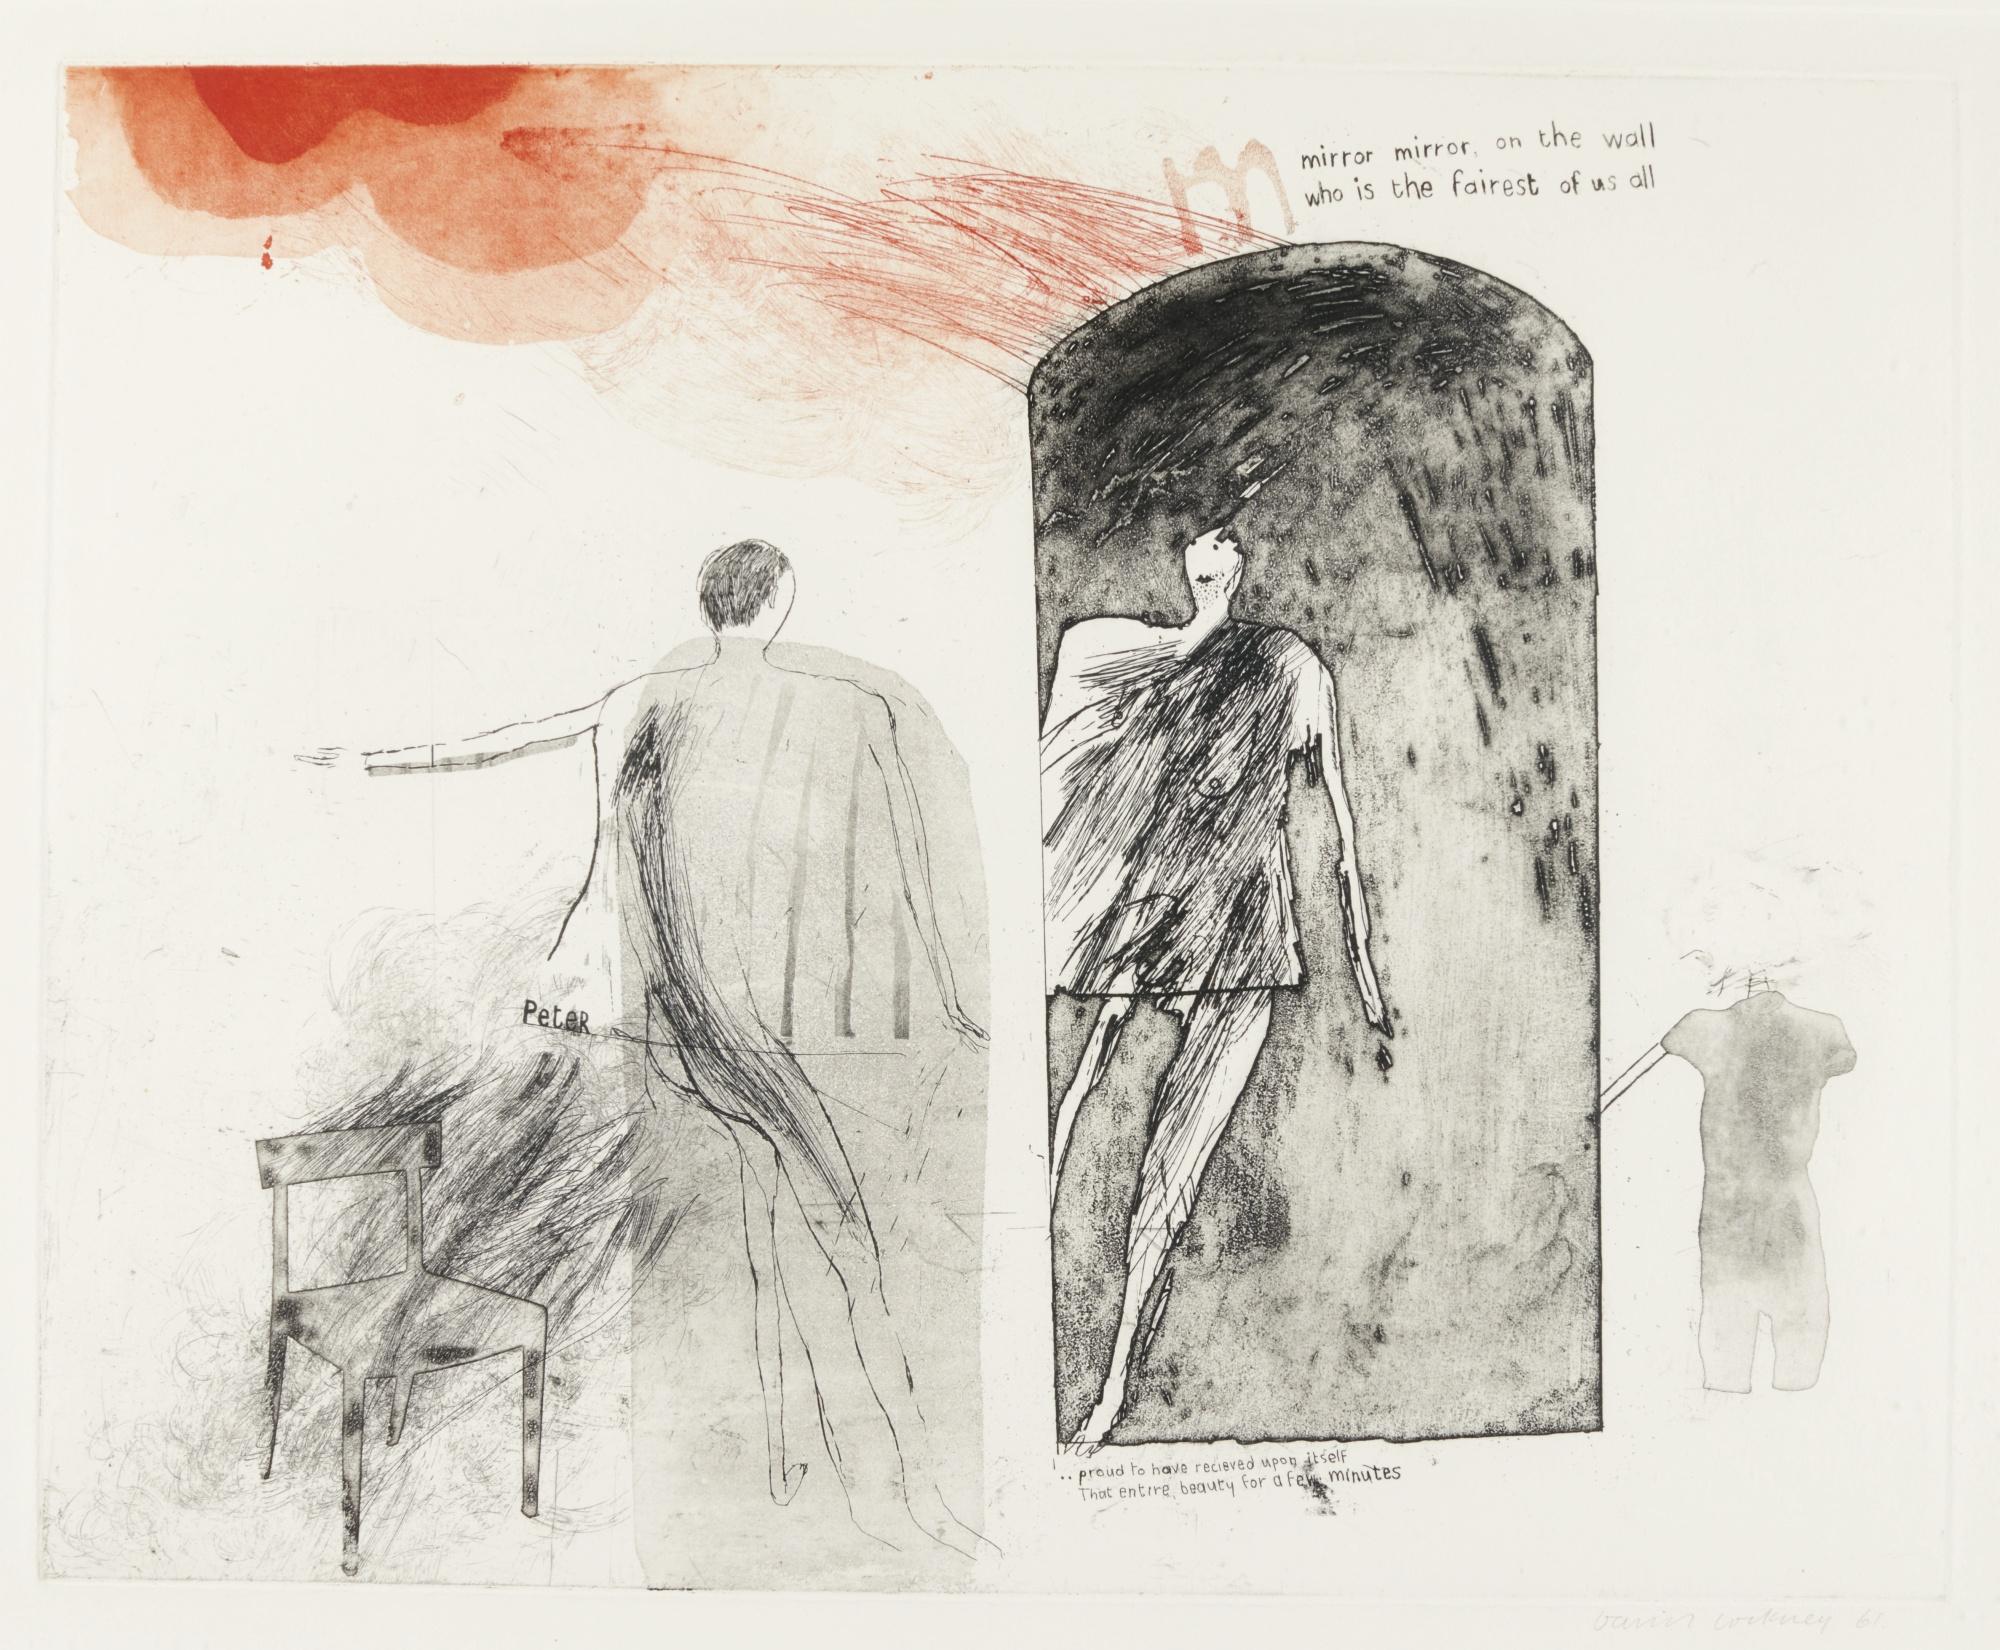 David Hockney-Mirror Mirror, On The Wall (S.A.C., Mca Tokyo 10)-1961